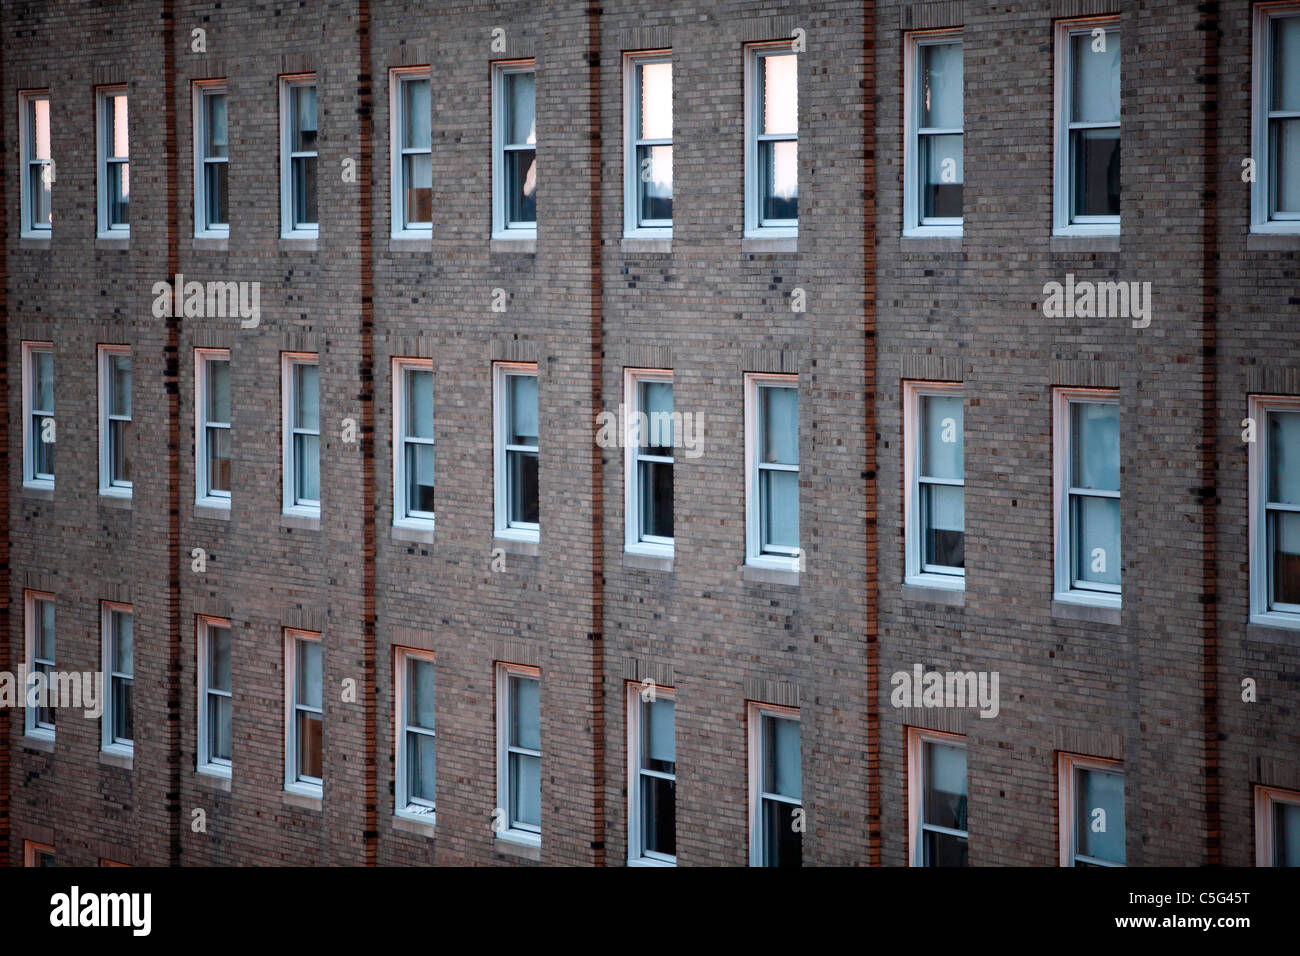 Rows of windows multi story building - Stock Image